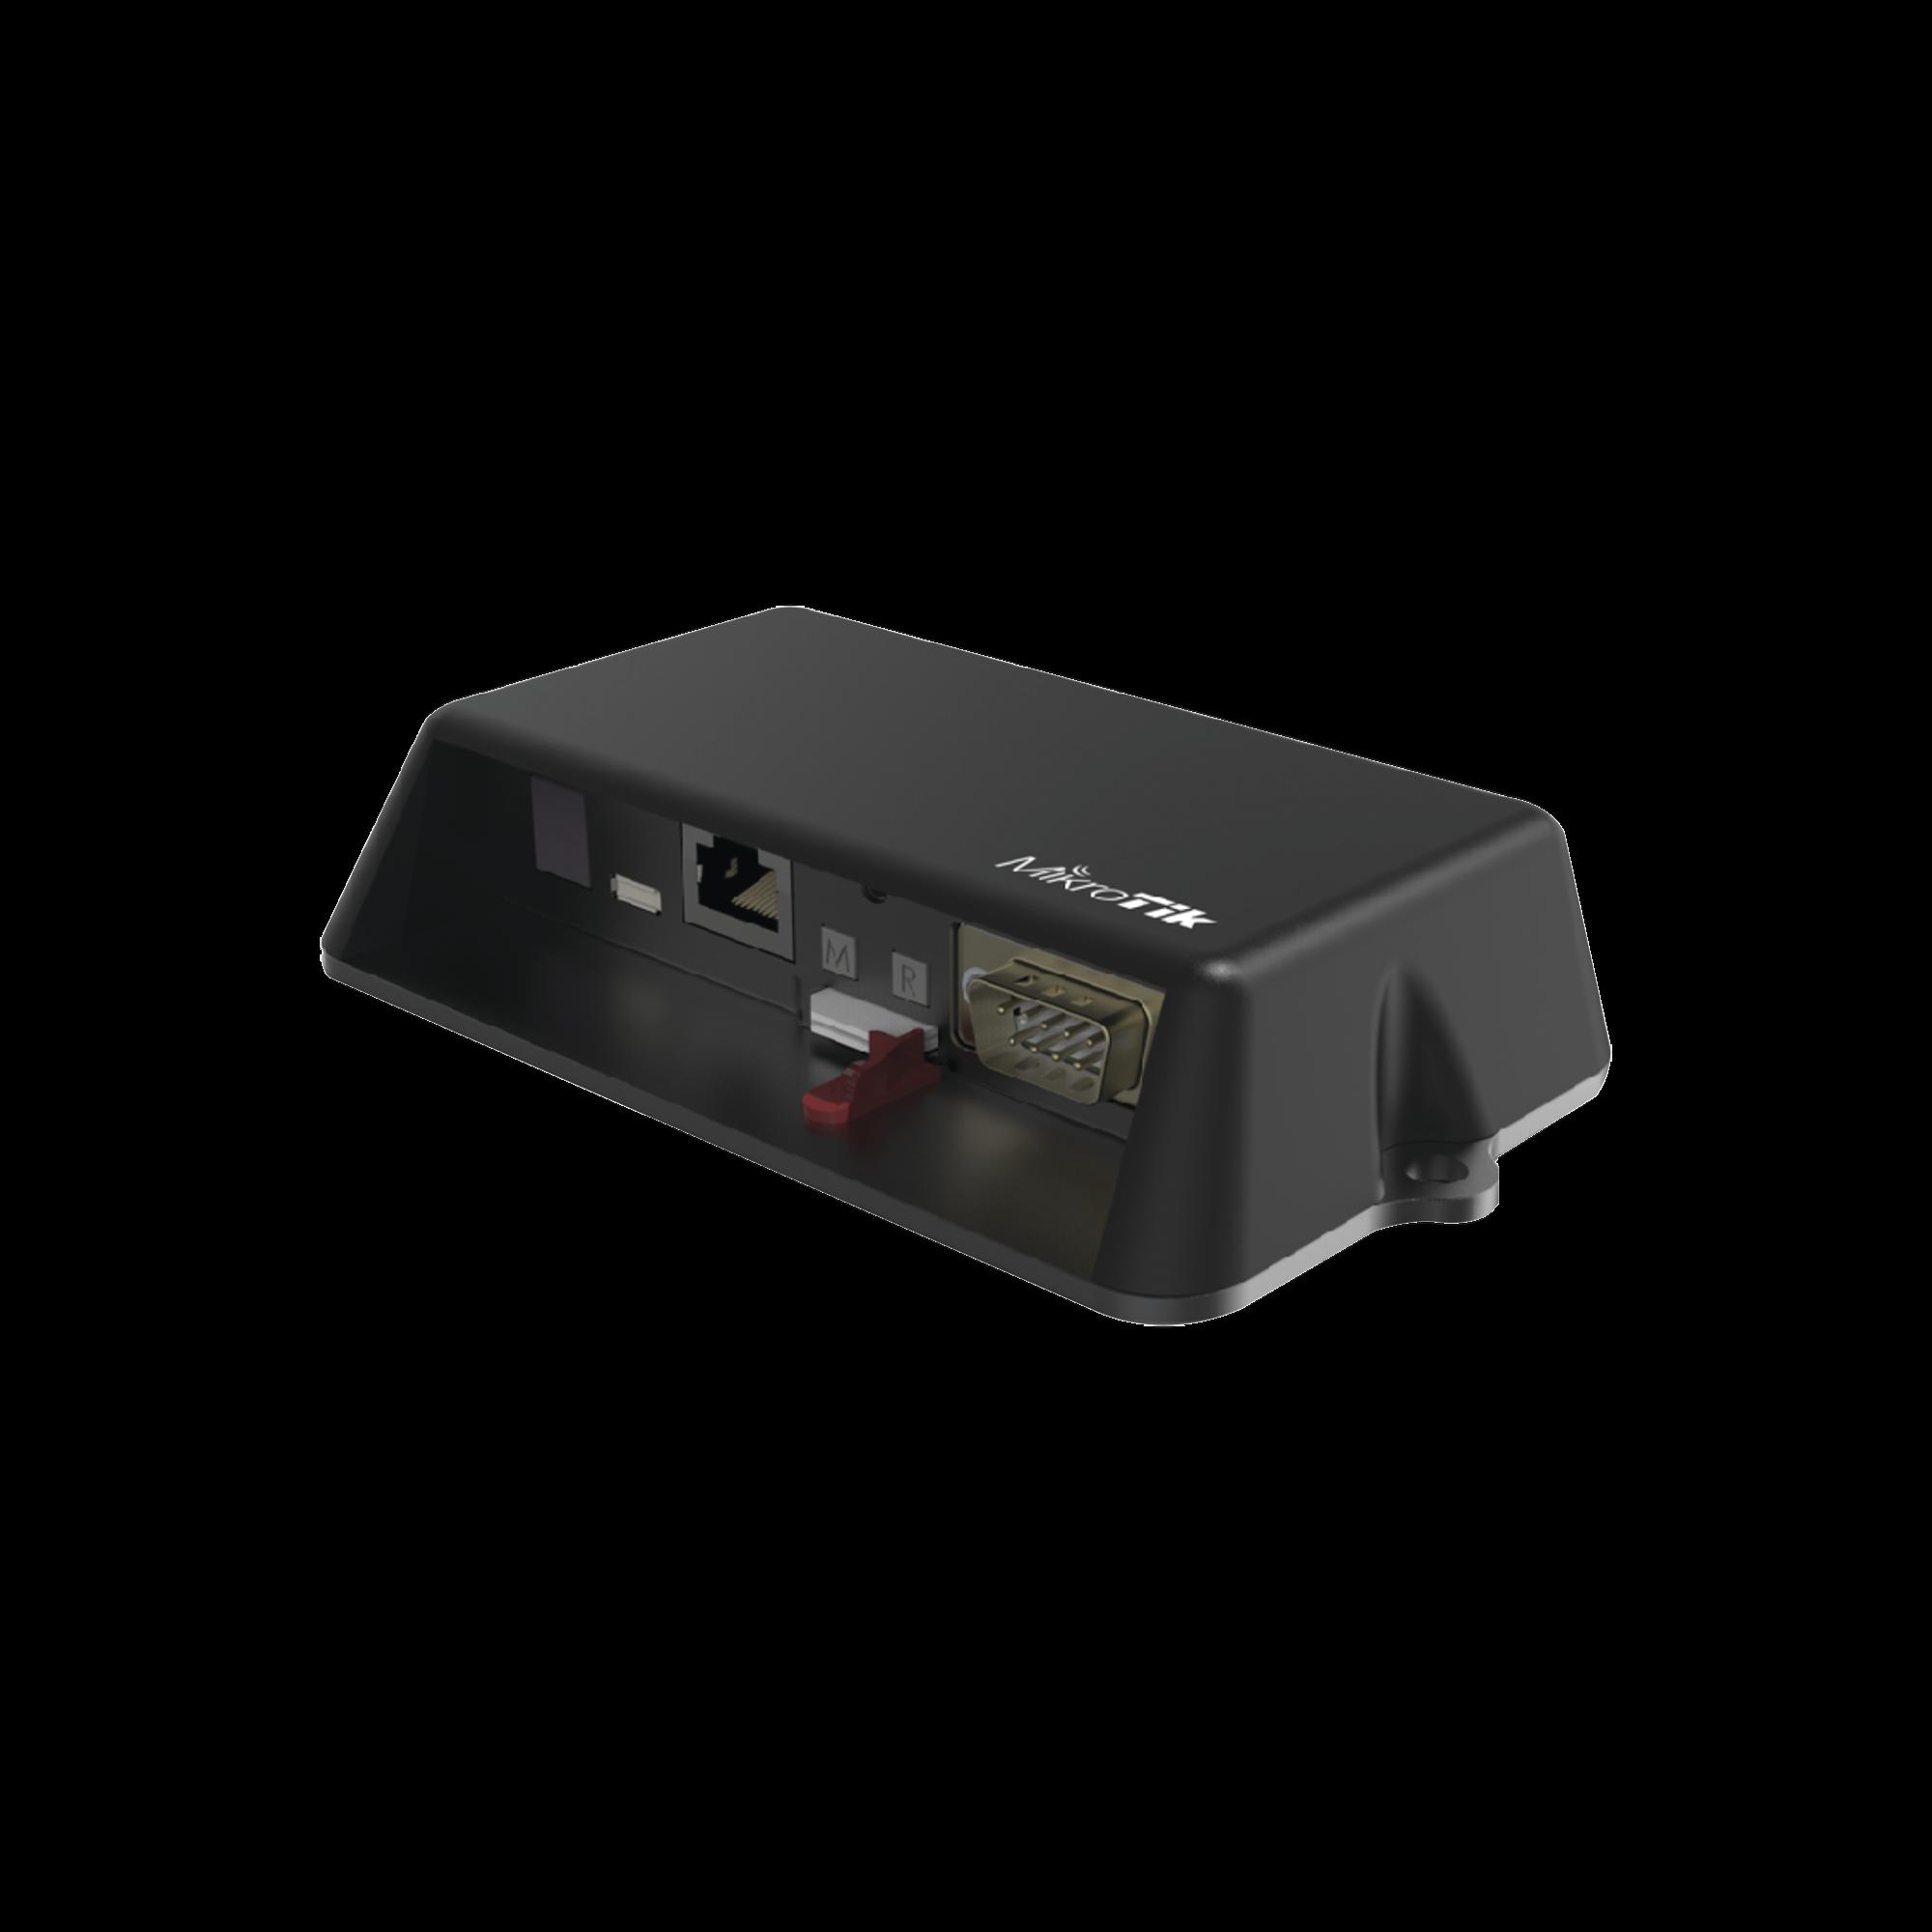 (LtAP mini LTE) Modem 4G(LTE) para SIM, con Wi-Fi 2.4 GHz, Para uso en vehículos, c/puerto fast ethernet, 2 SIM, Bandas(2,4,5,12)